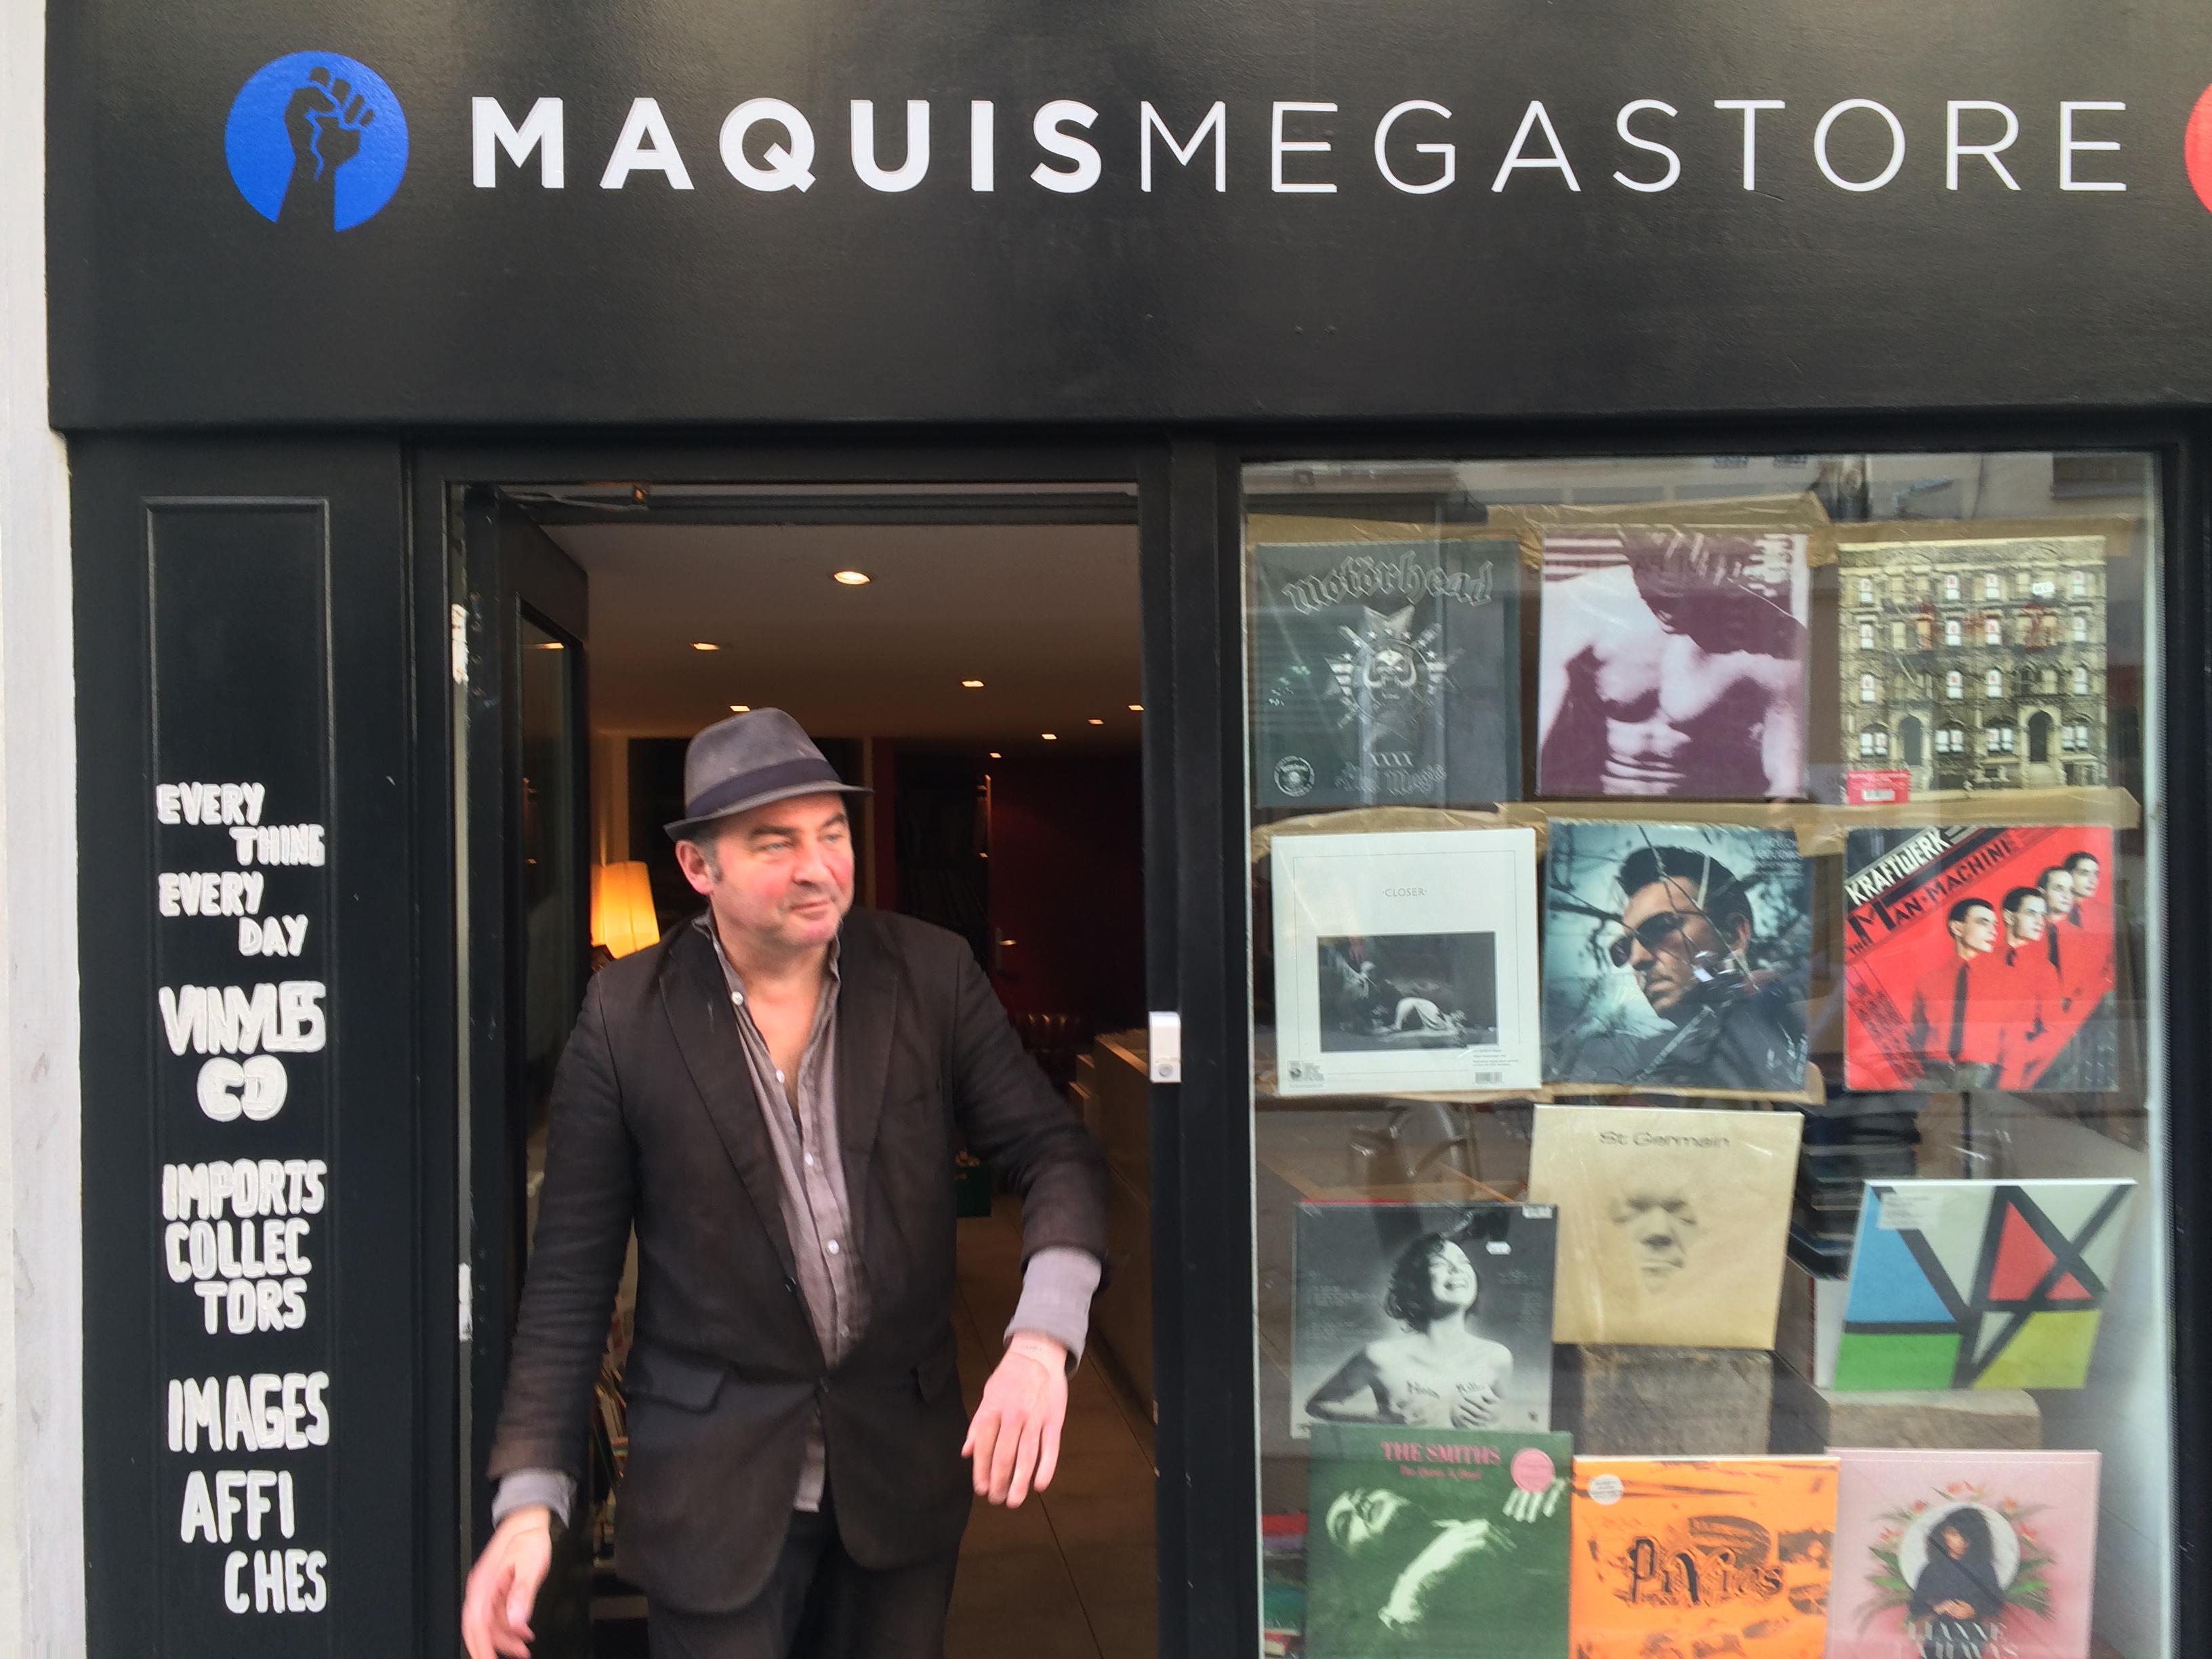 PPA @ ze Maquis Megastore